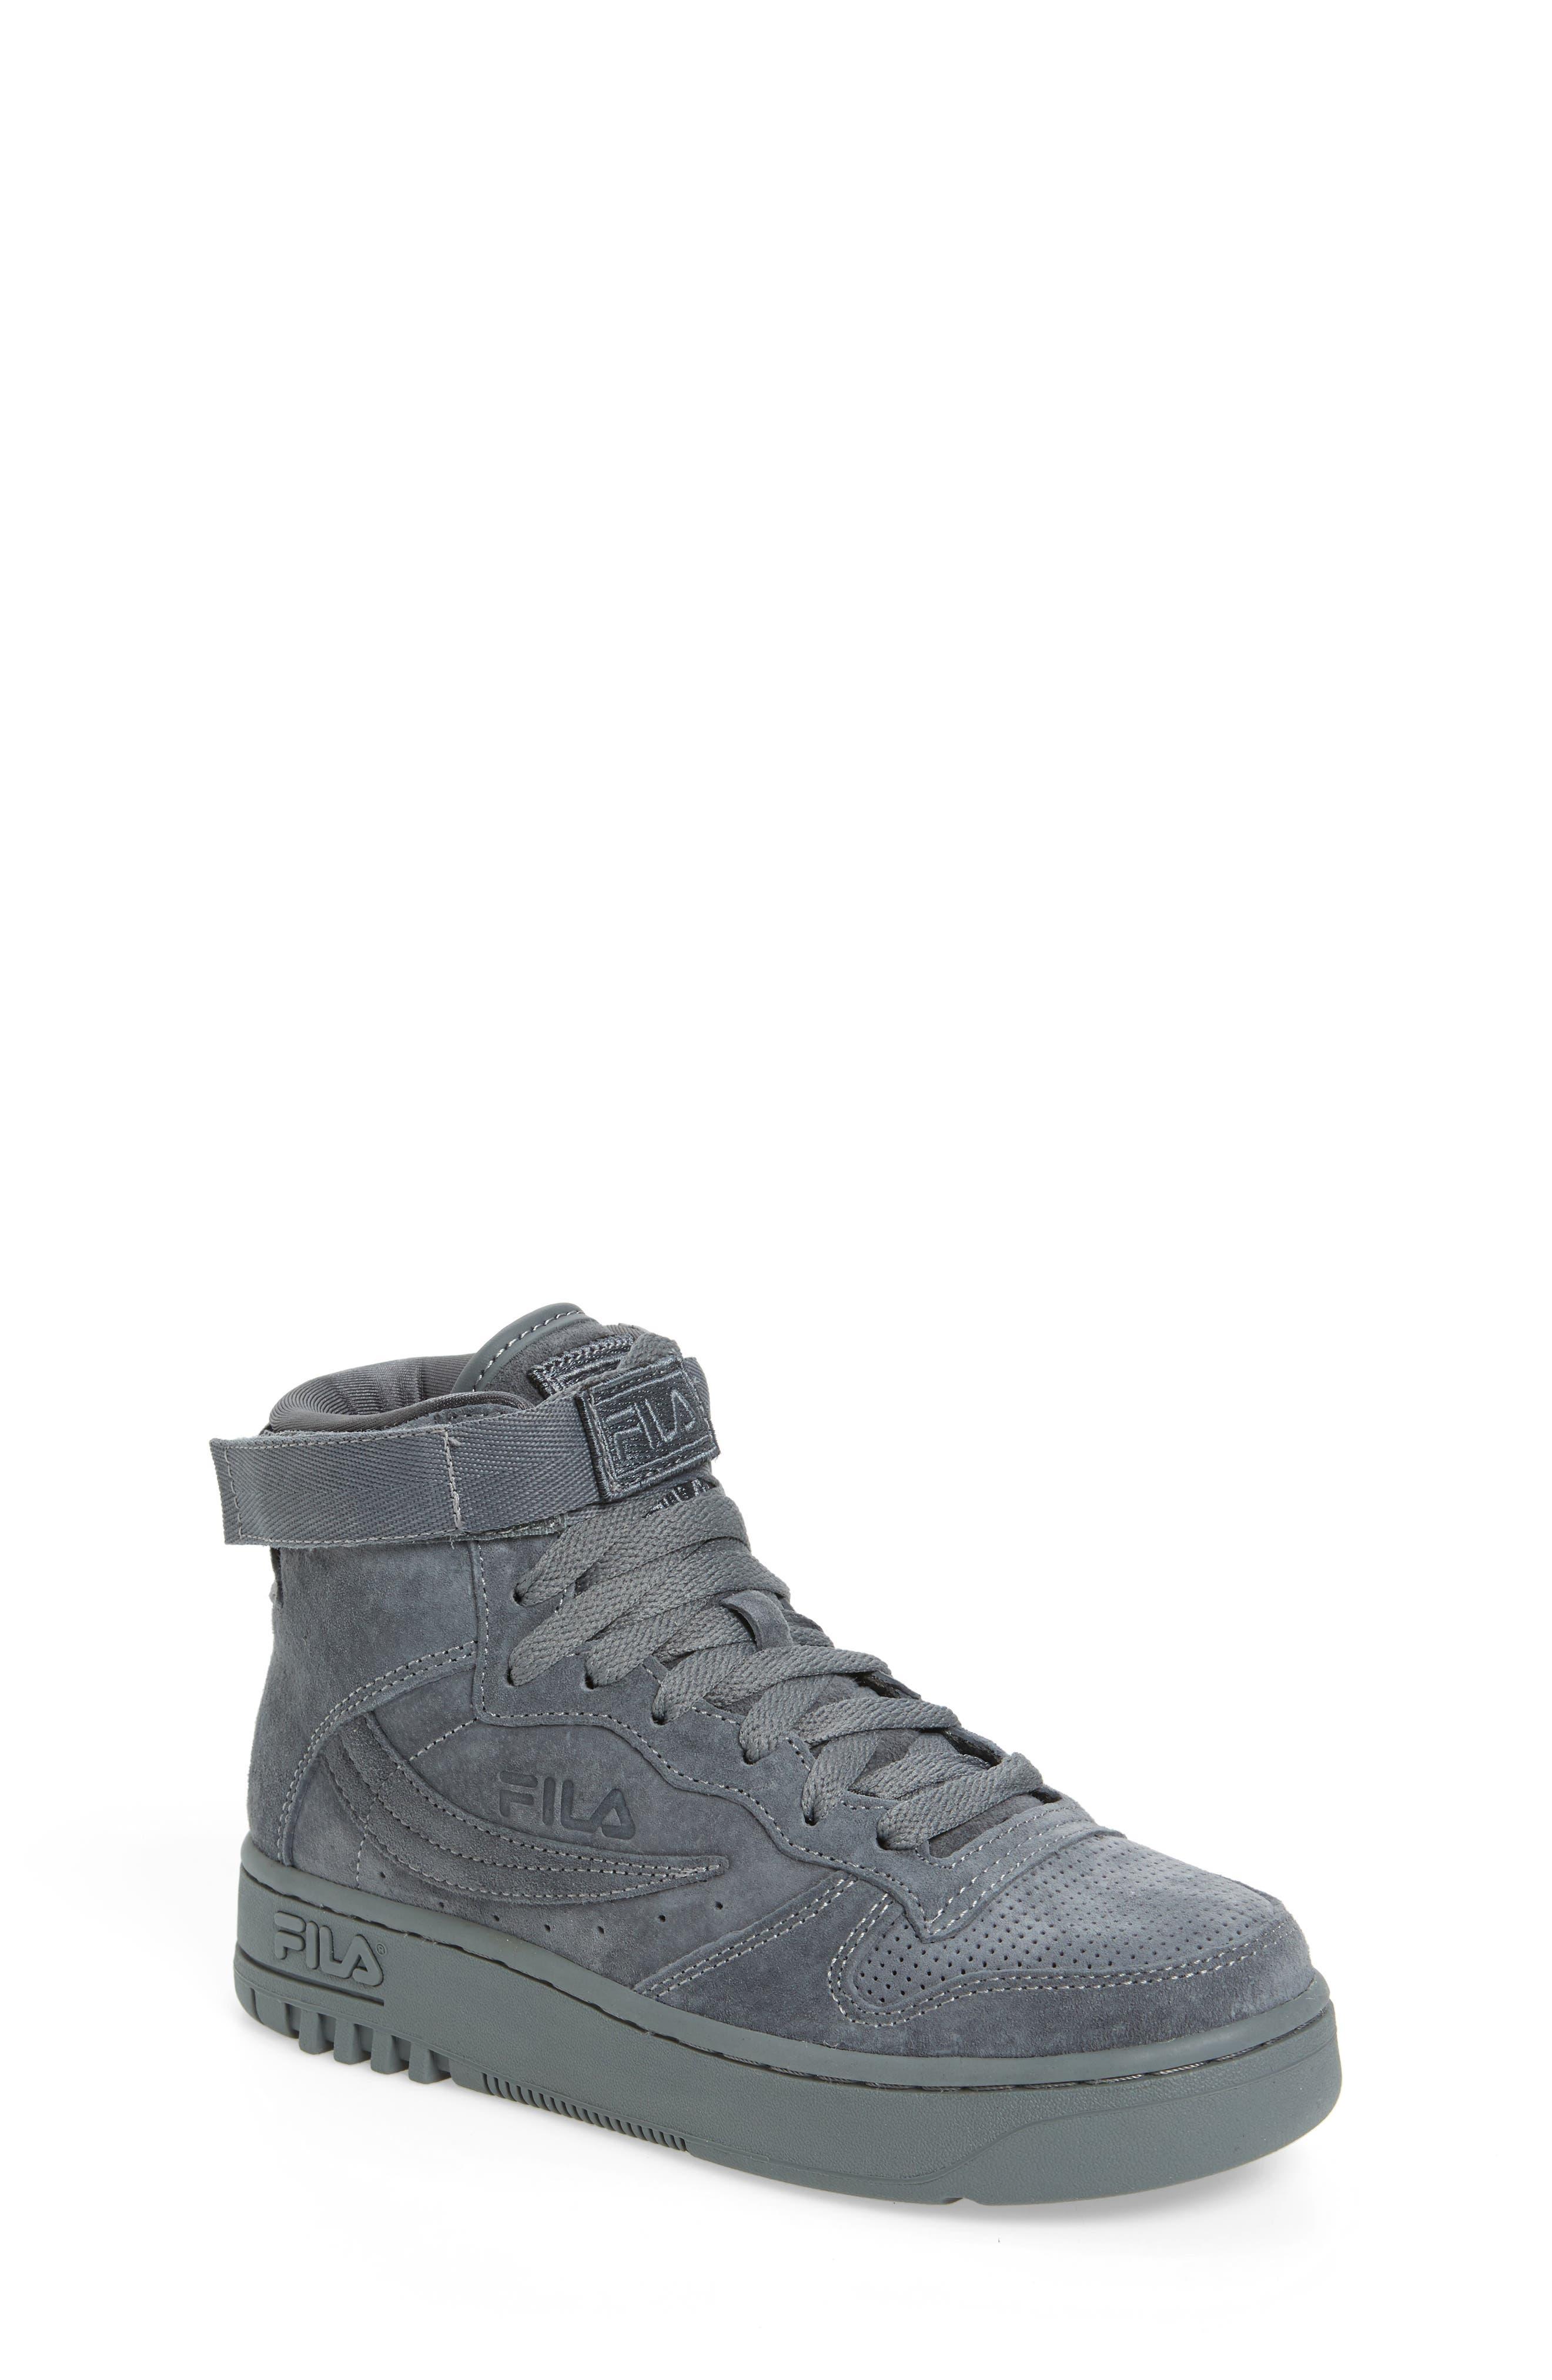 USA FX-100 High Top Sneaker,                             Main thumbnail 1, color,                             050